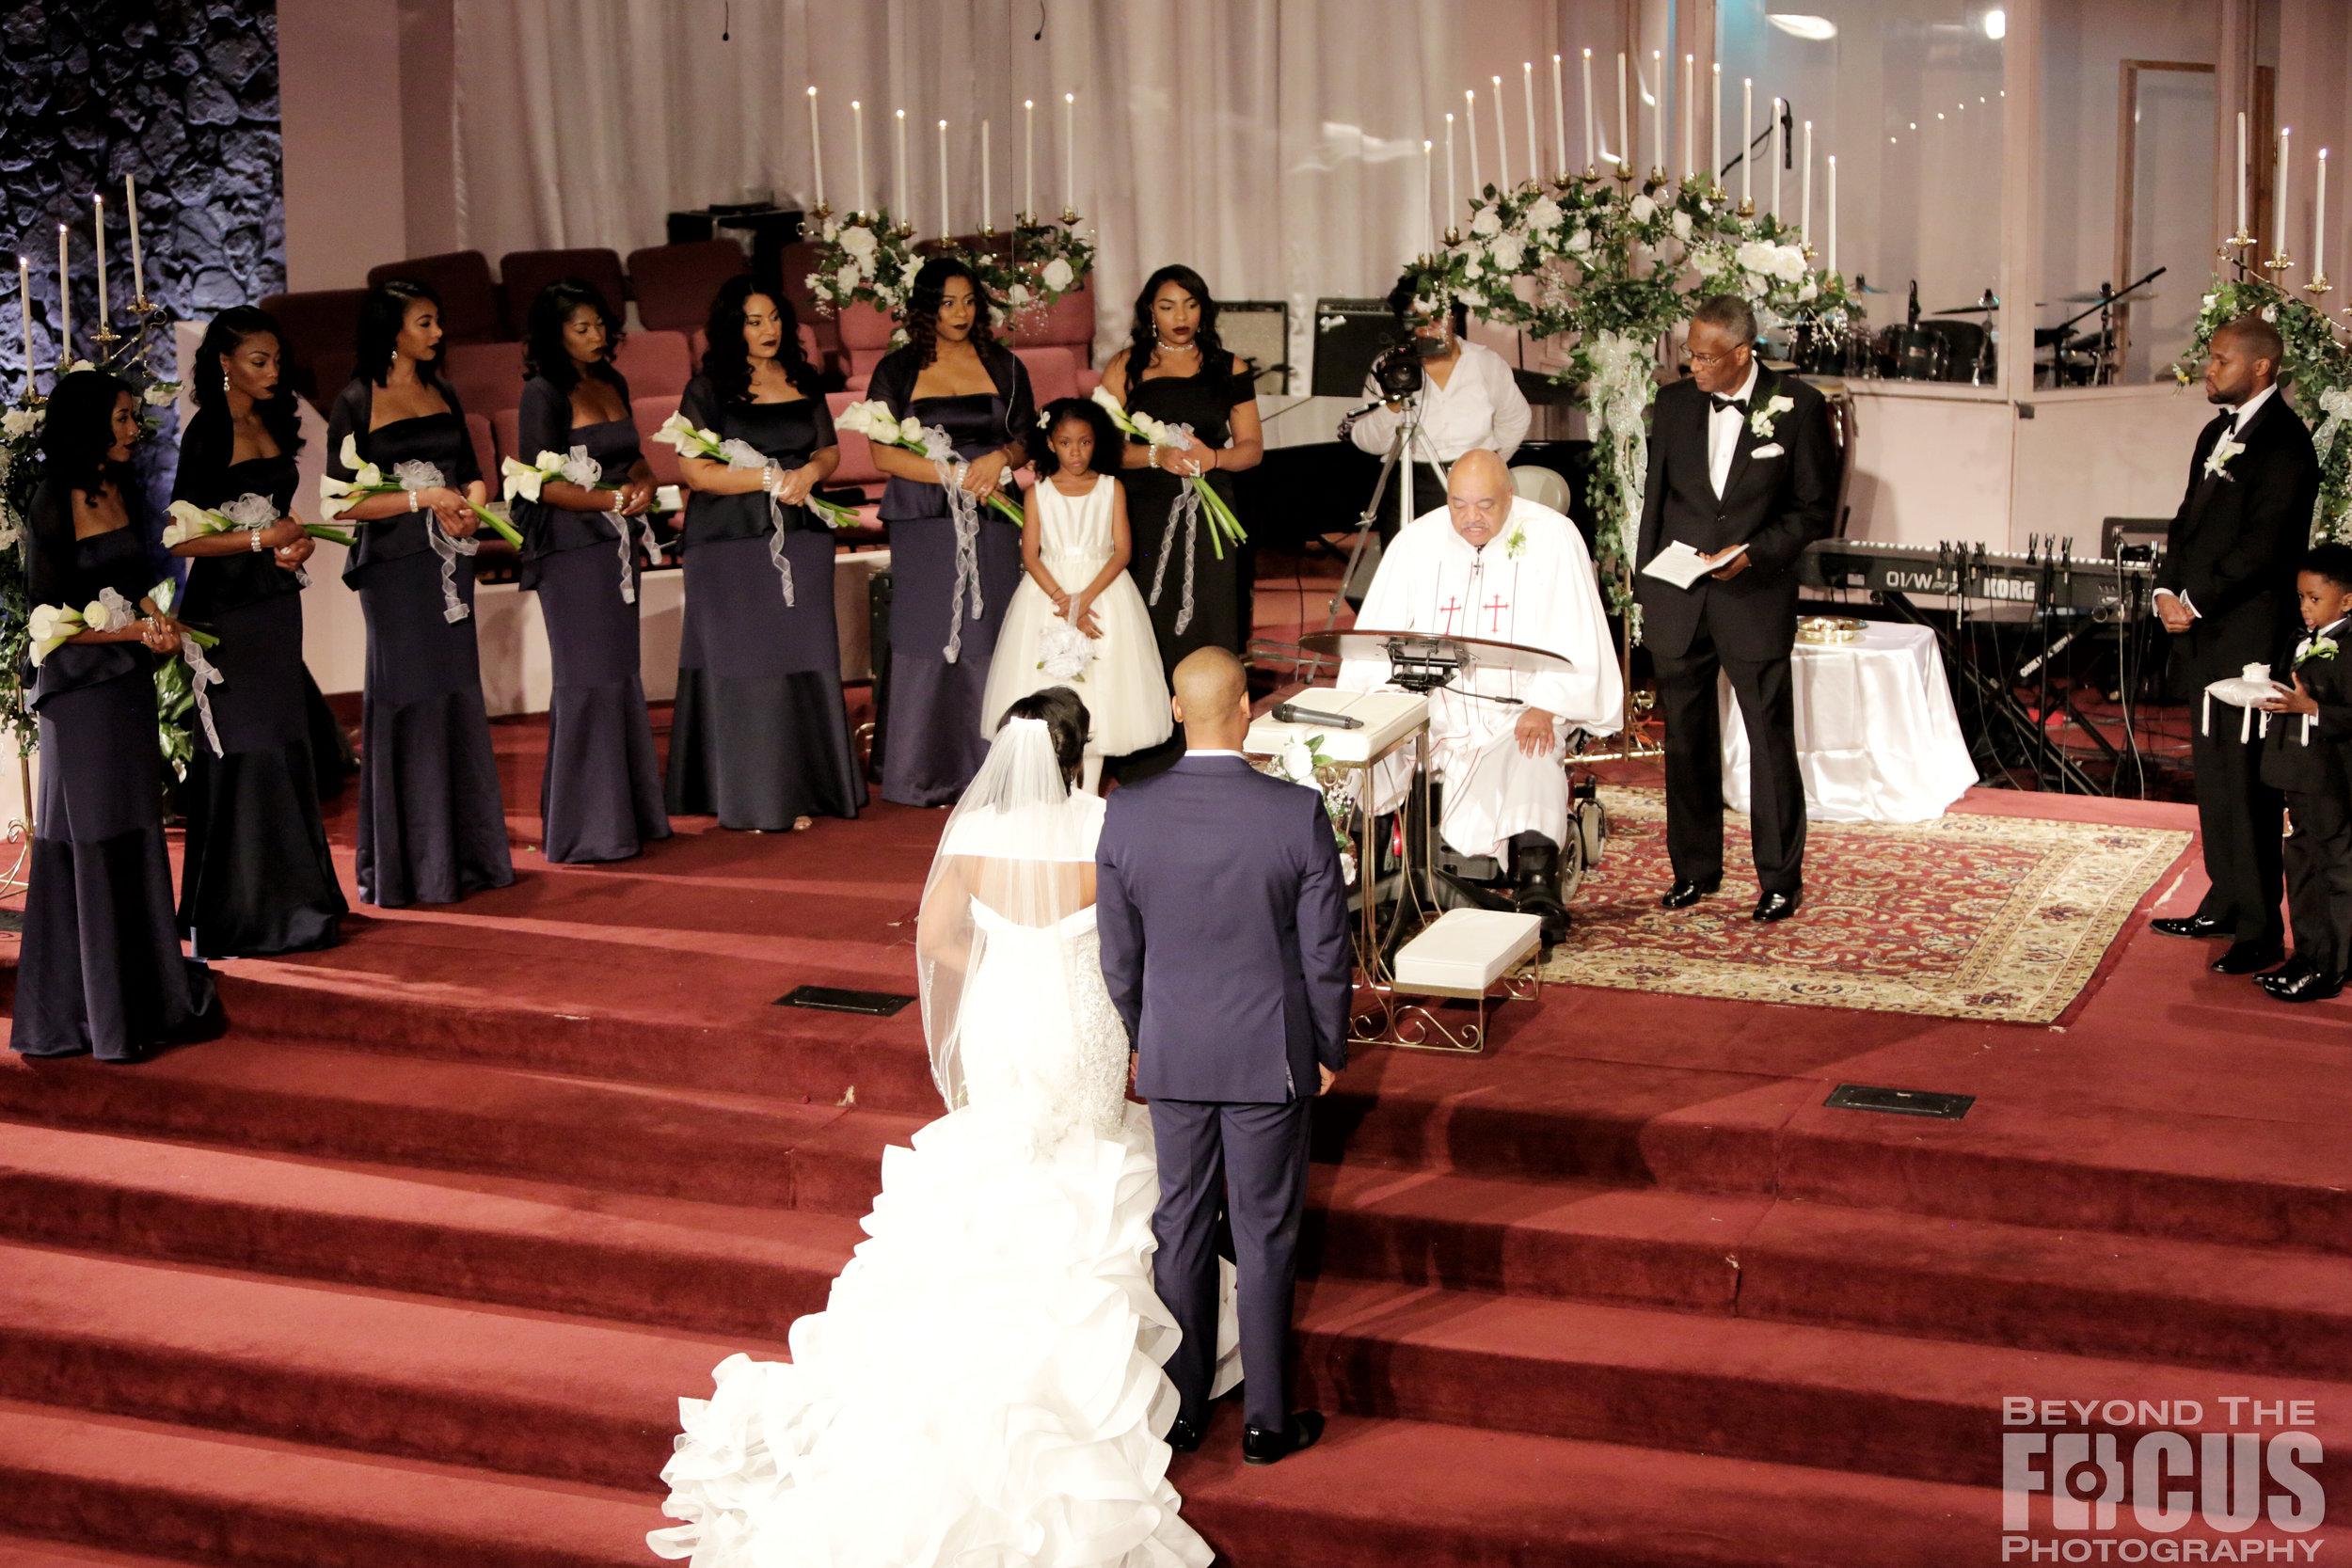 Matthews_Wedding_Ceremony_55.jpg